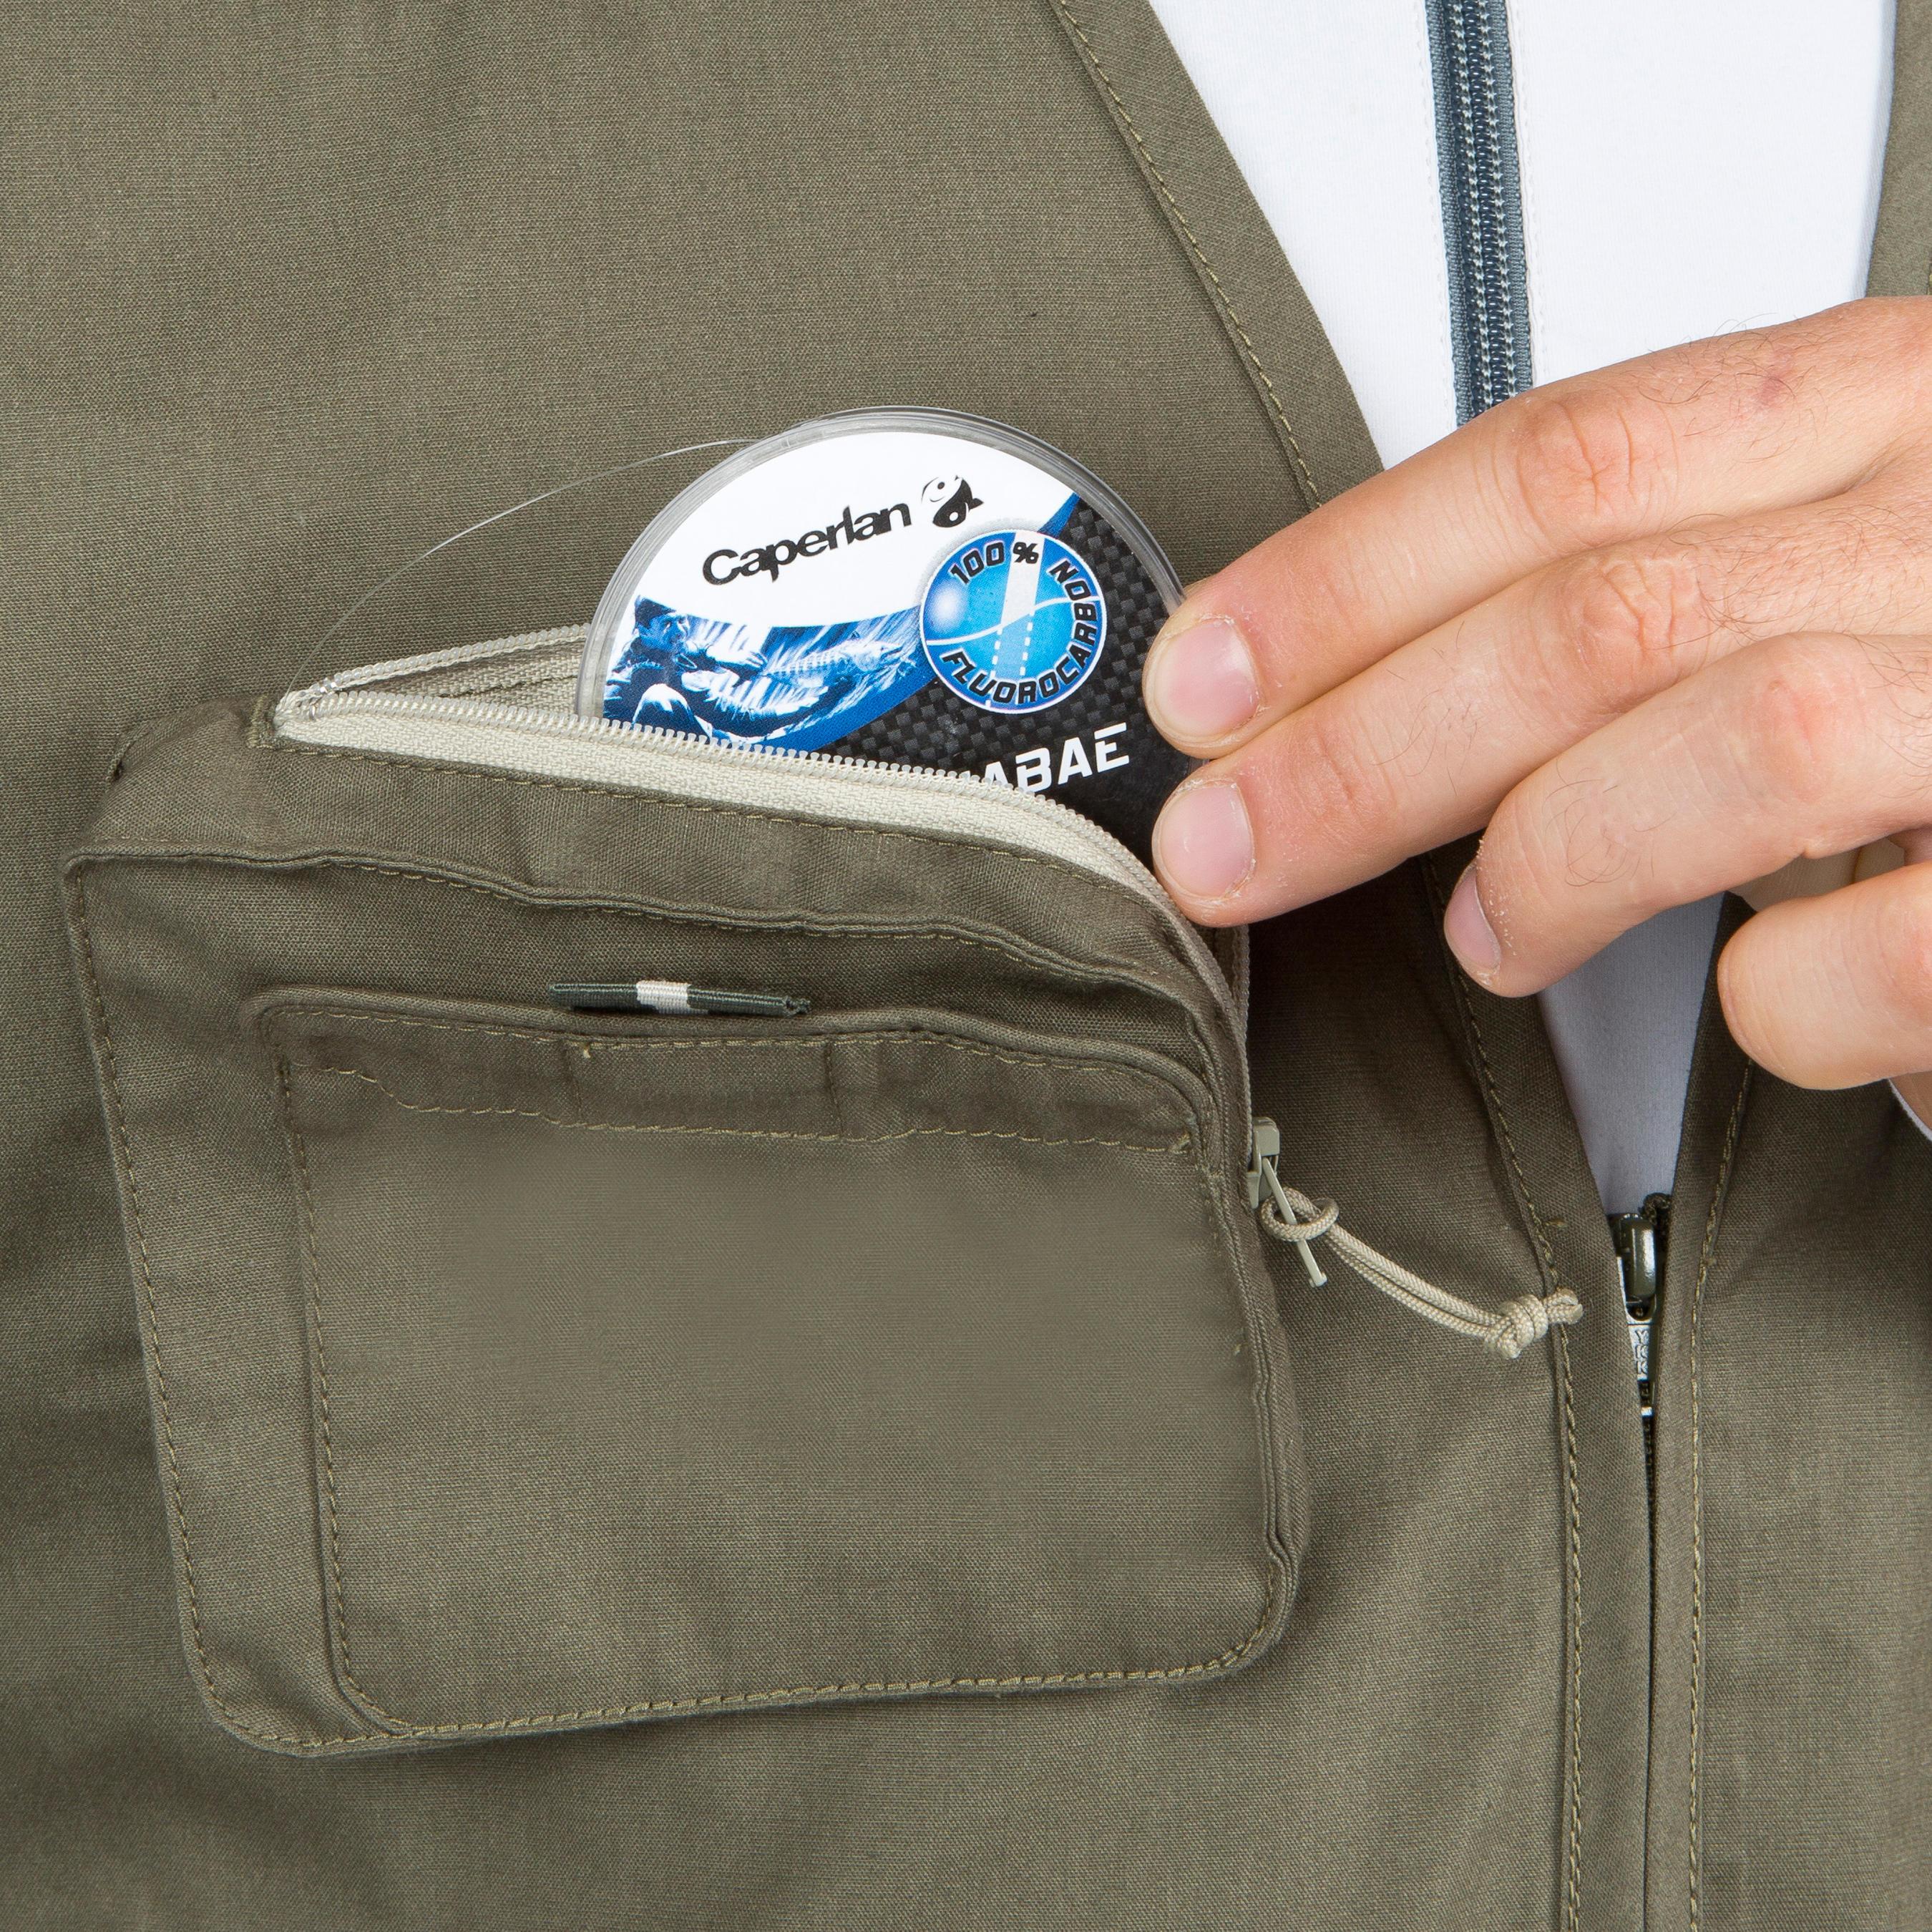 CAPERLAN 100 Fishing Gilet - Khaki